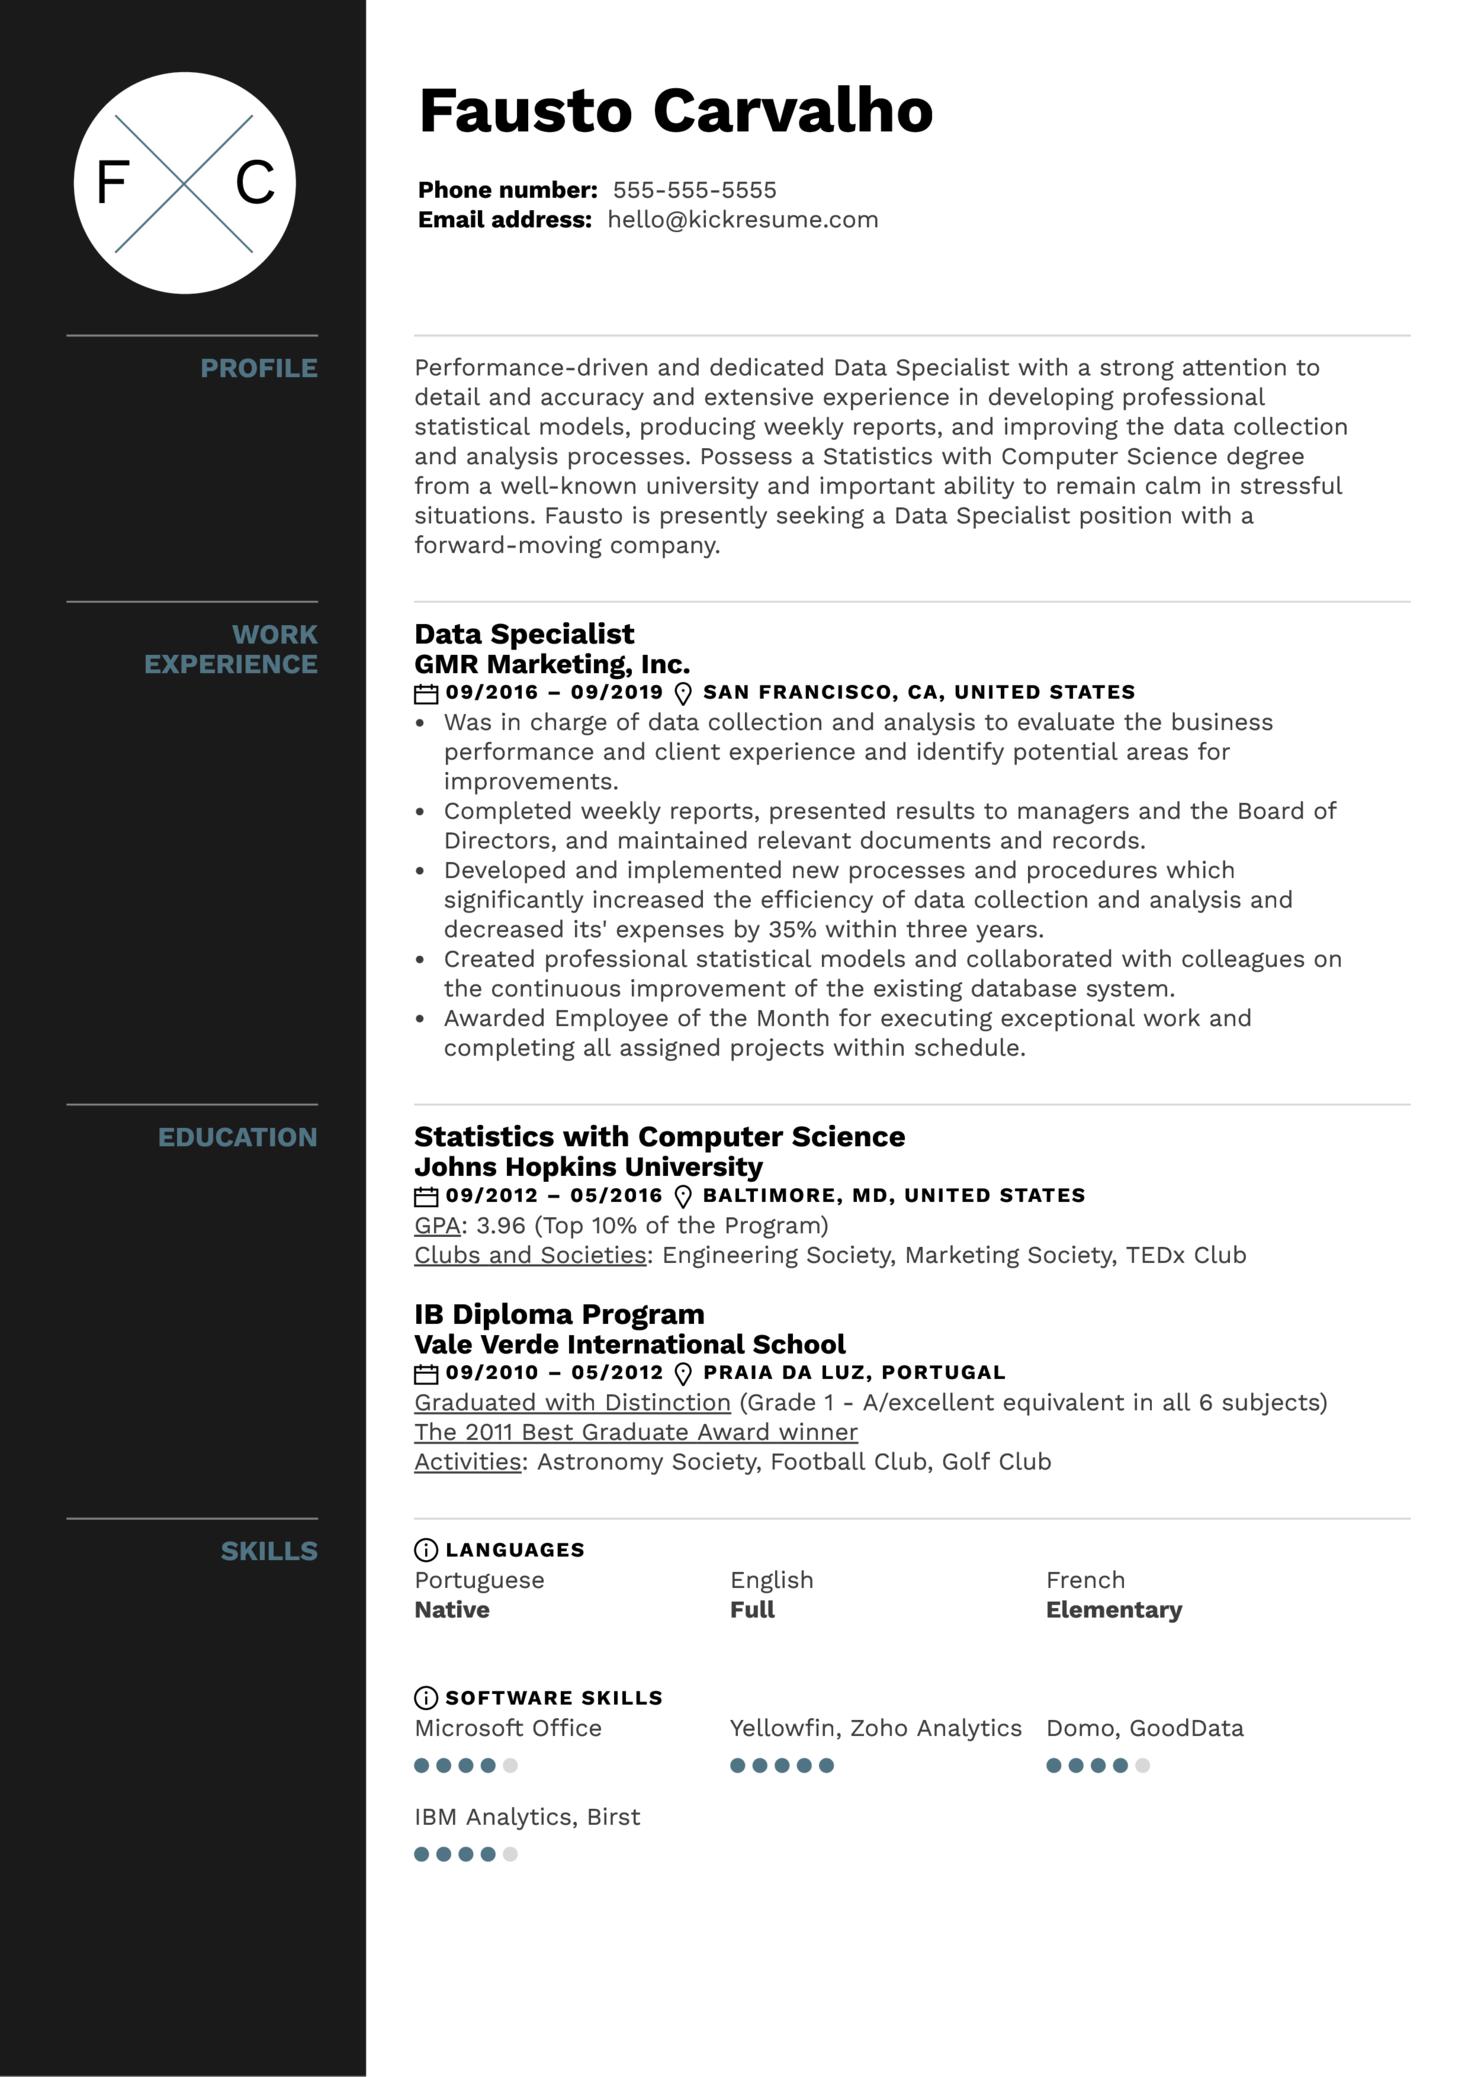 Data Specialist Resume Example